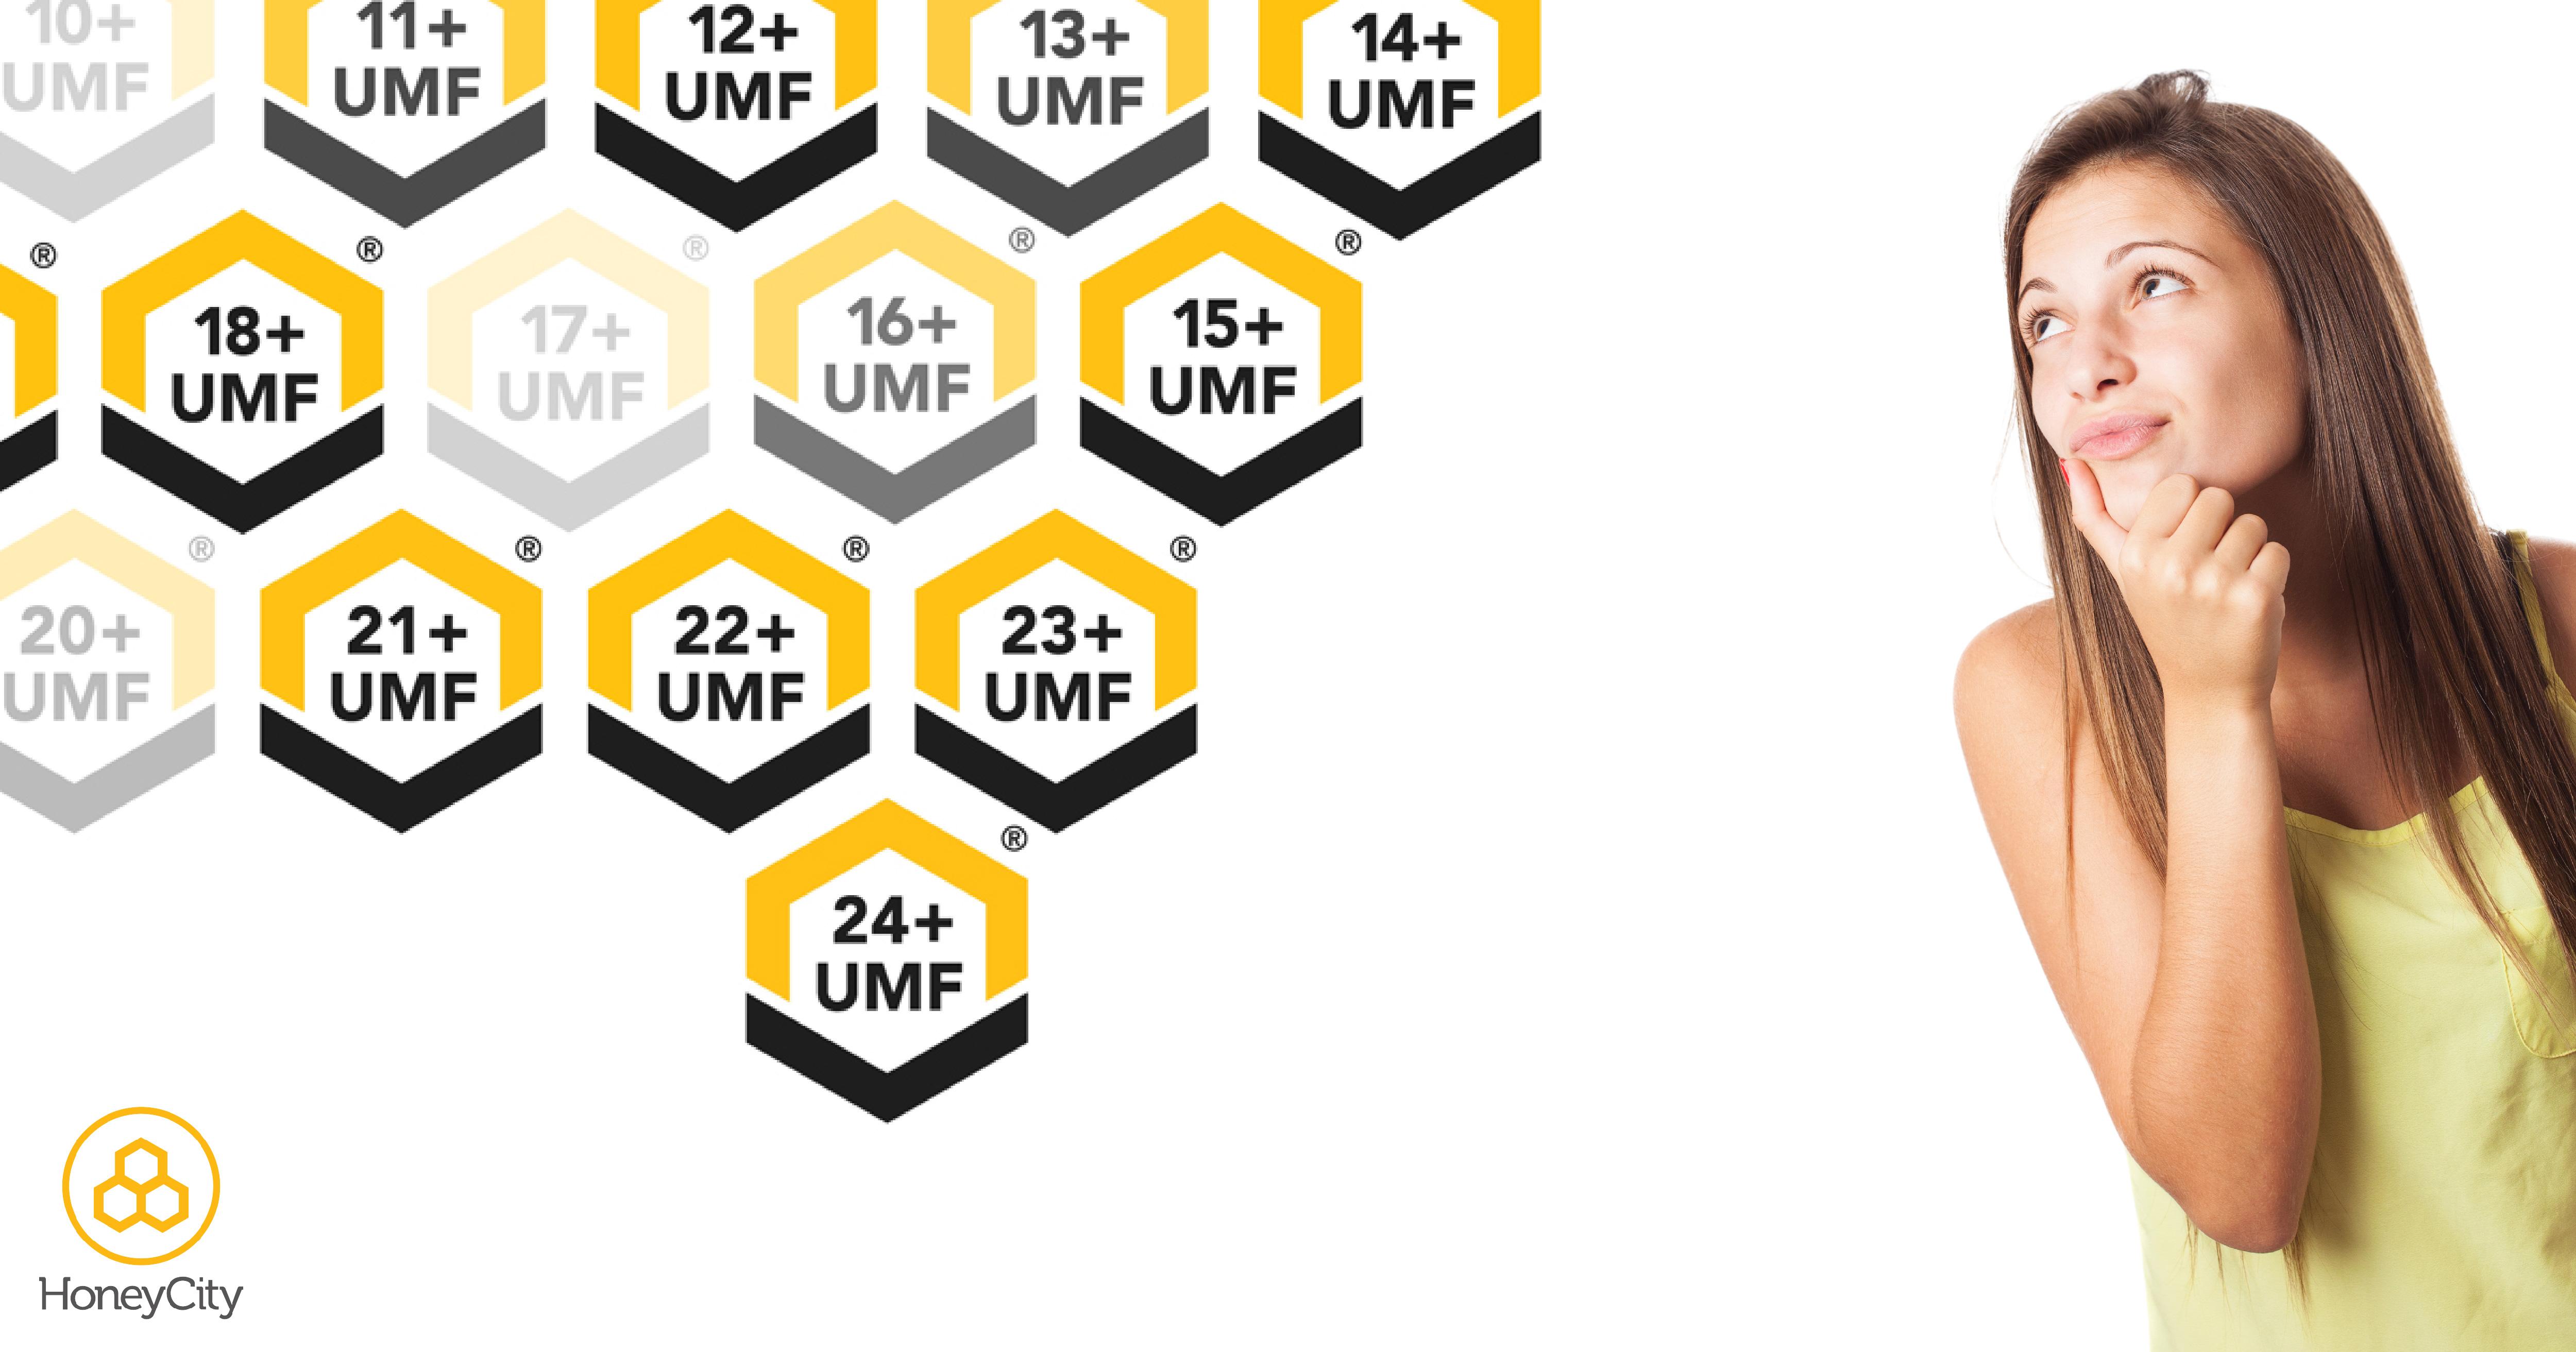 Manuka Honey UMF- Which UMF for me?